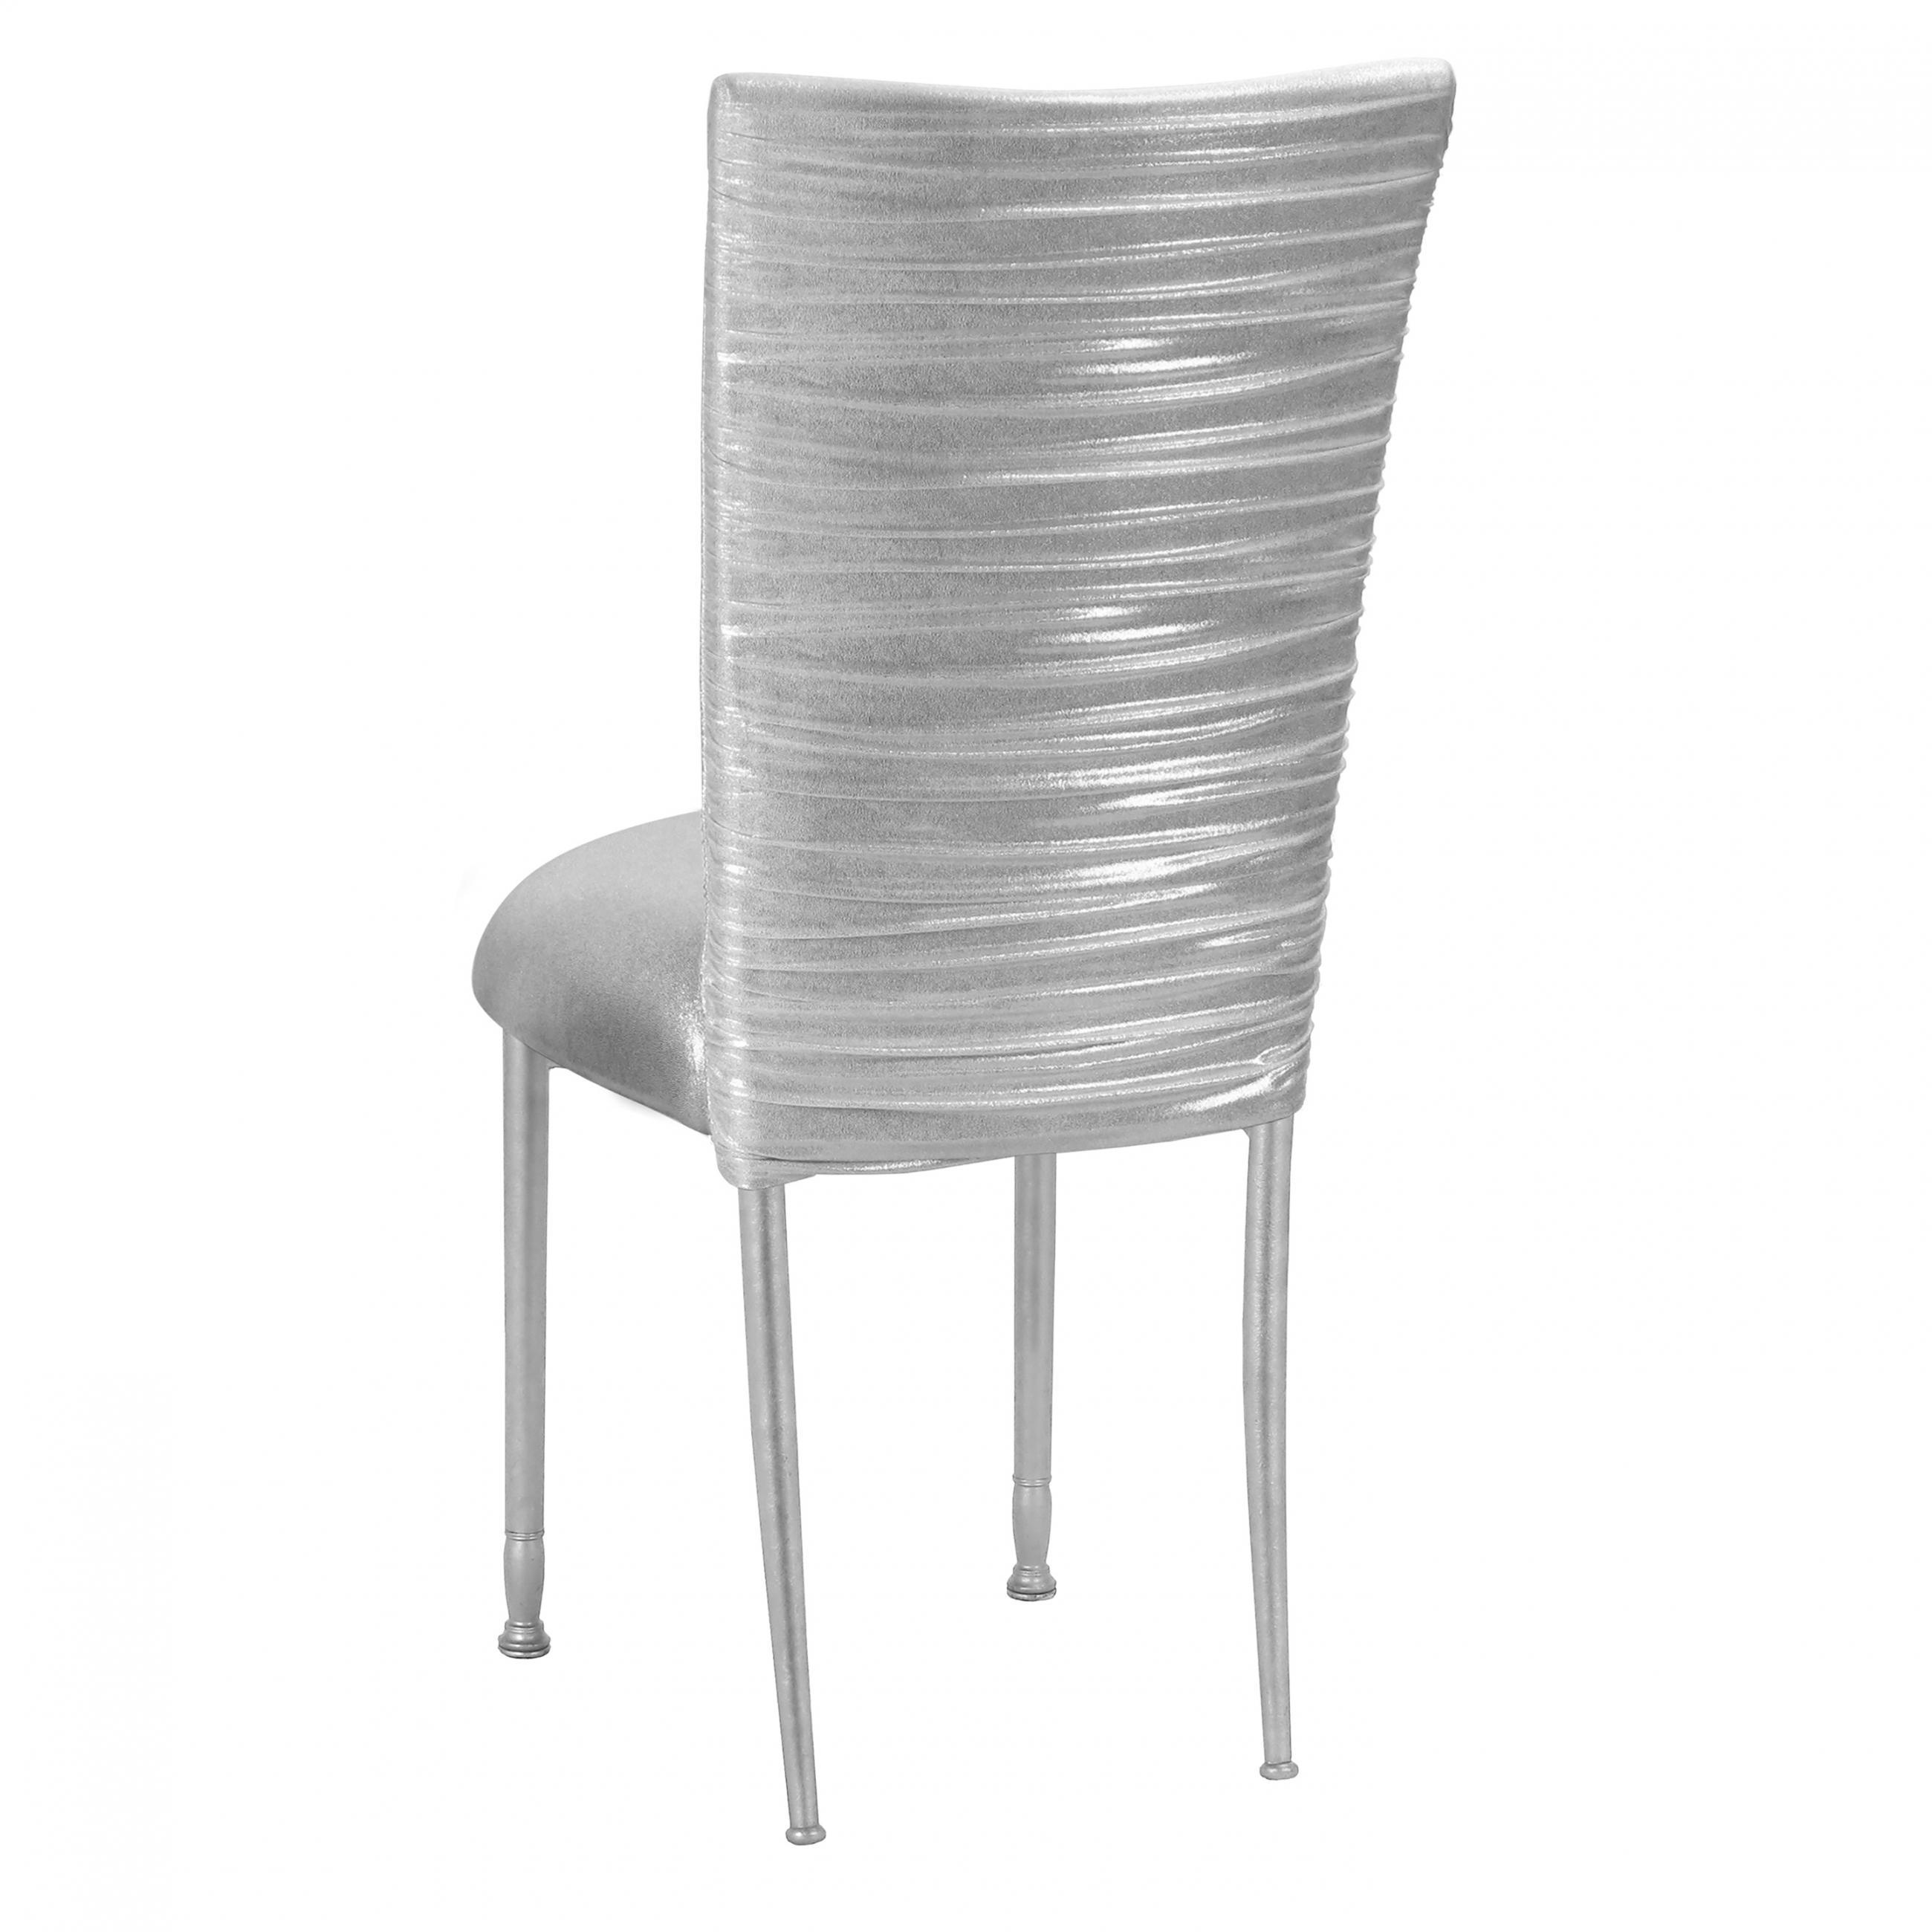 Wondrous Chloe Metallic Silver On White Foil Fanfare Chameleon Chair Beatyapartments Chair Design Images Beatyapartmentscom